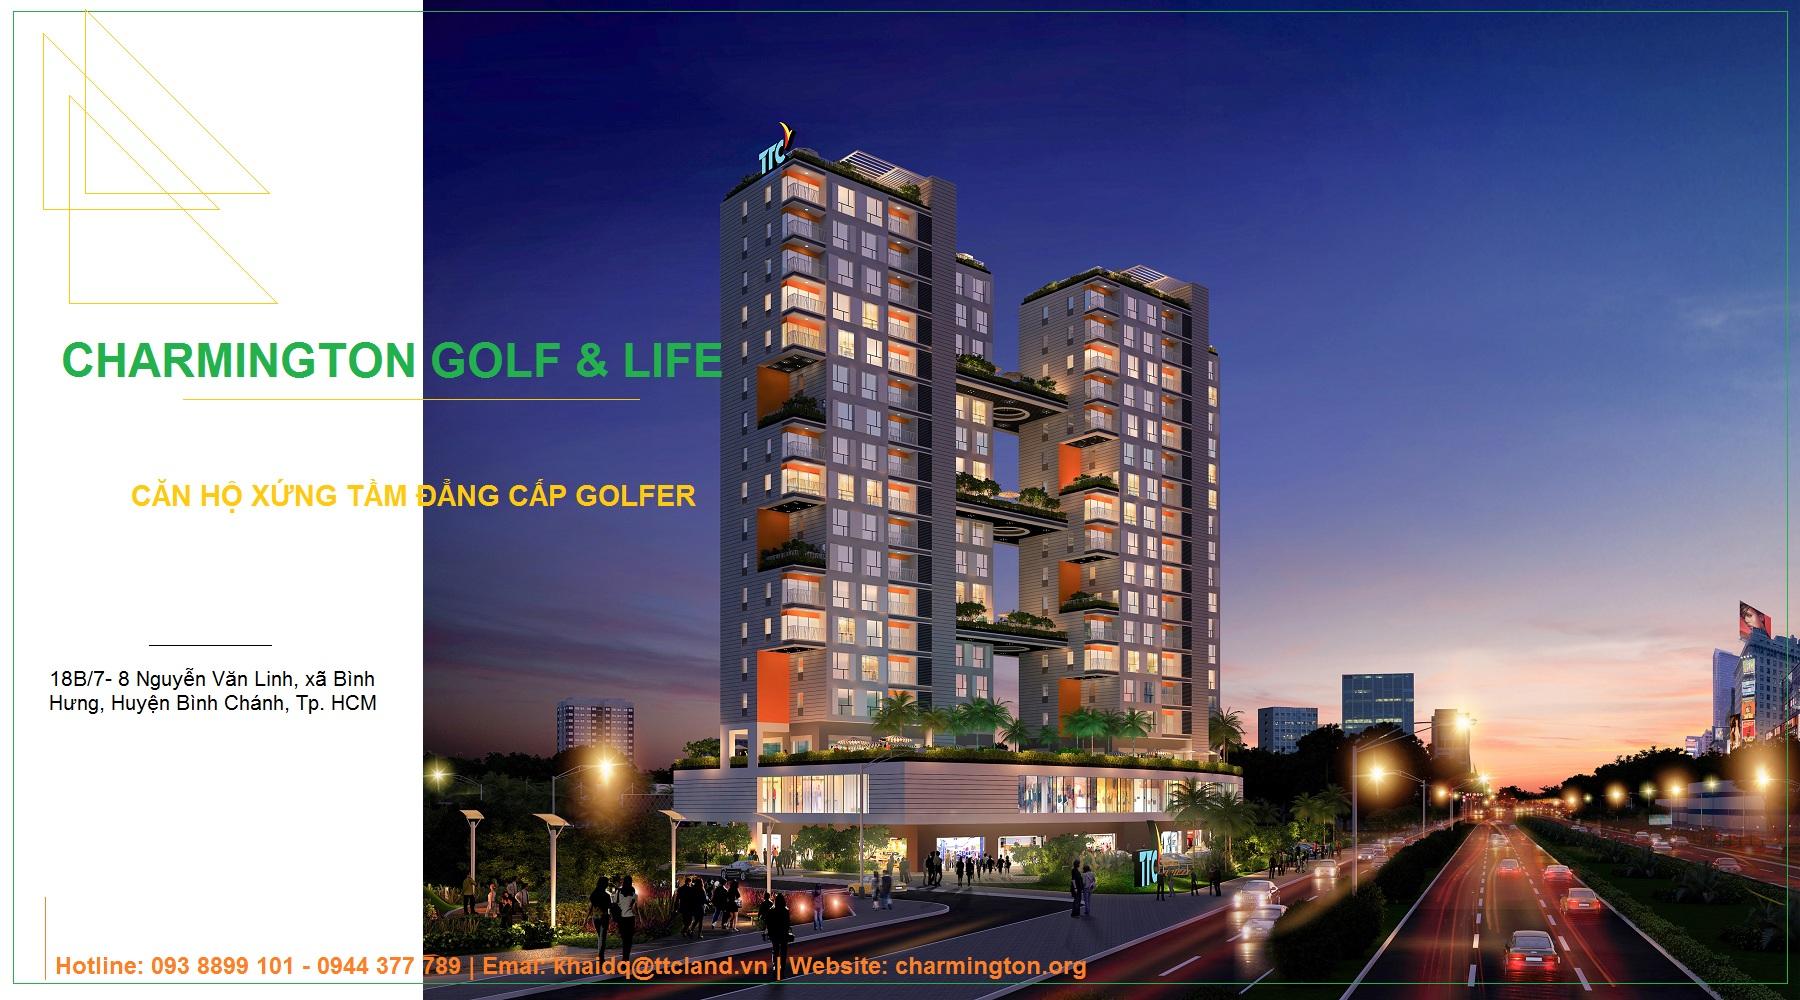 http://charmington.org/public/upload/phoi-canh-dem-charmington-golf-life-1552494275.jpg